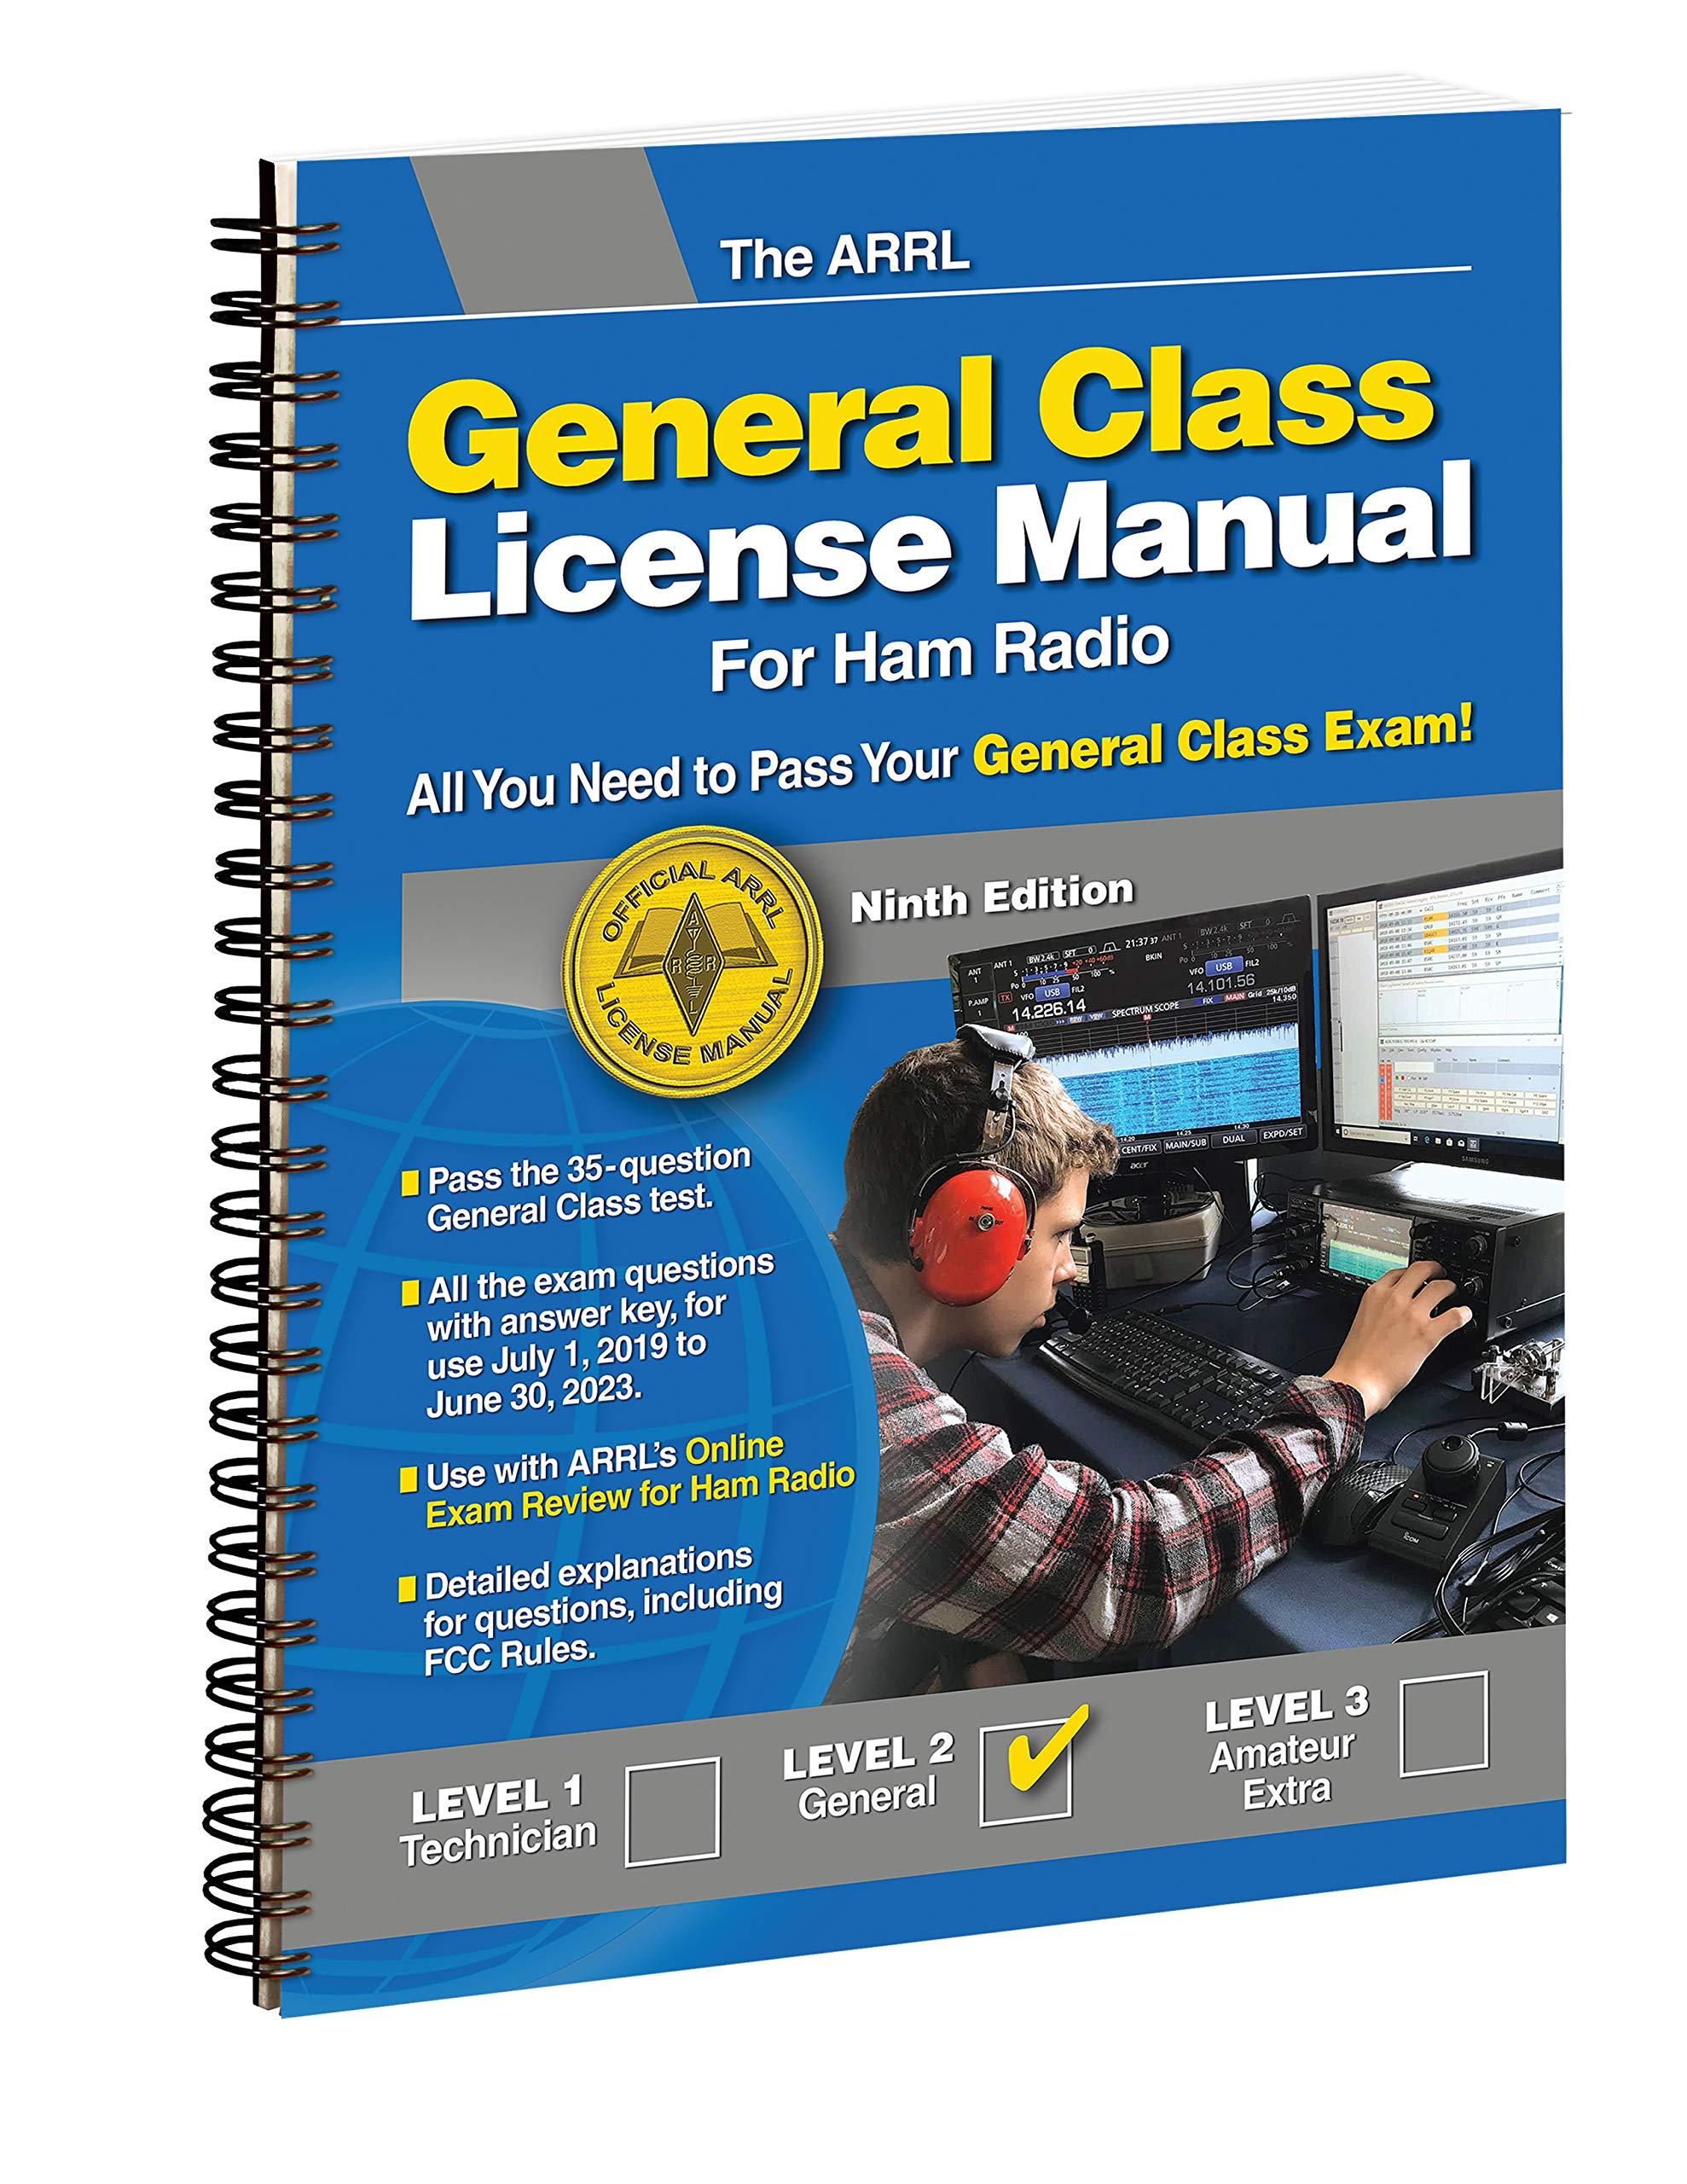 The ARRL General Class License Manual: ARRL: 9781625951069